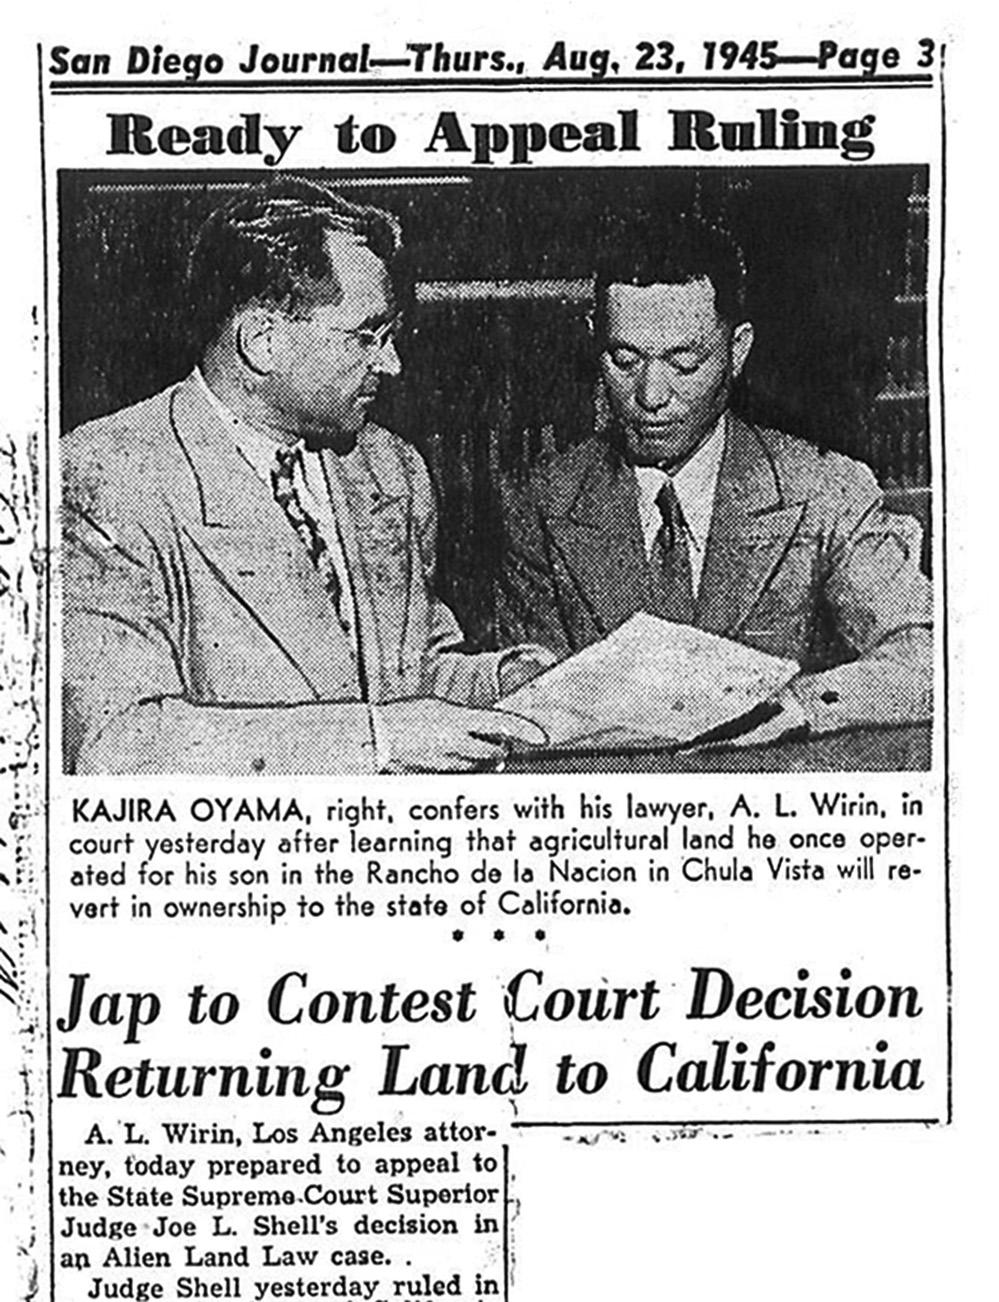 https://www.aclusandiego.org/oyama-v-california-us-supreme-court-rules-californias/